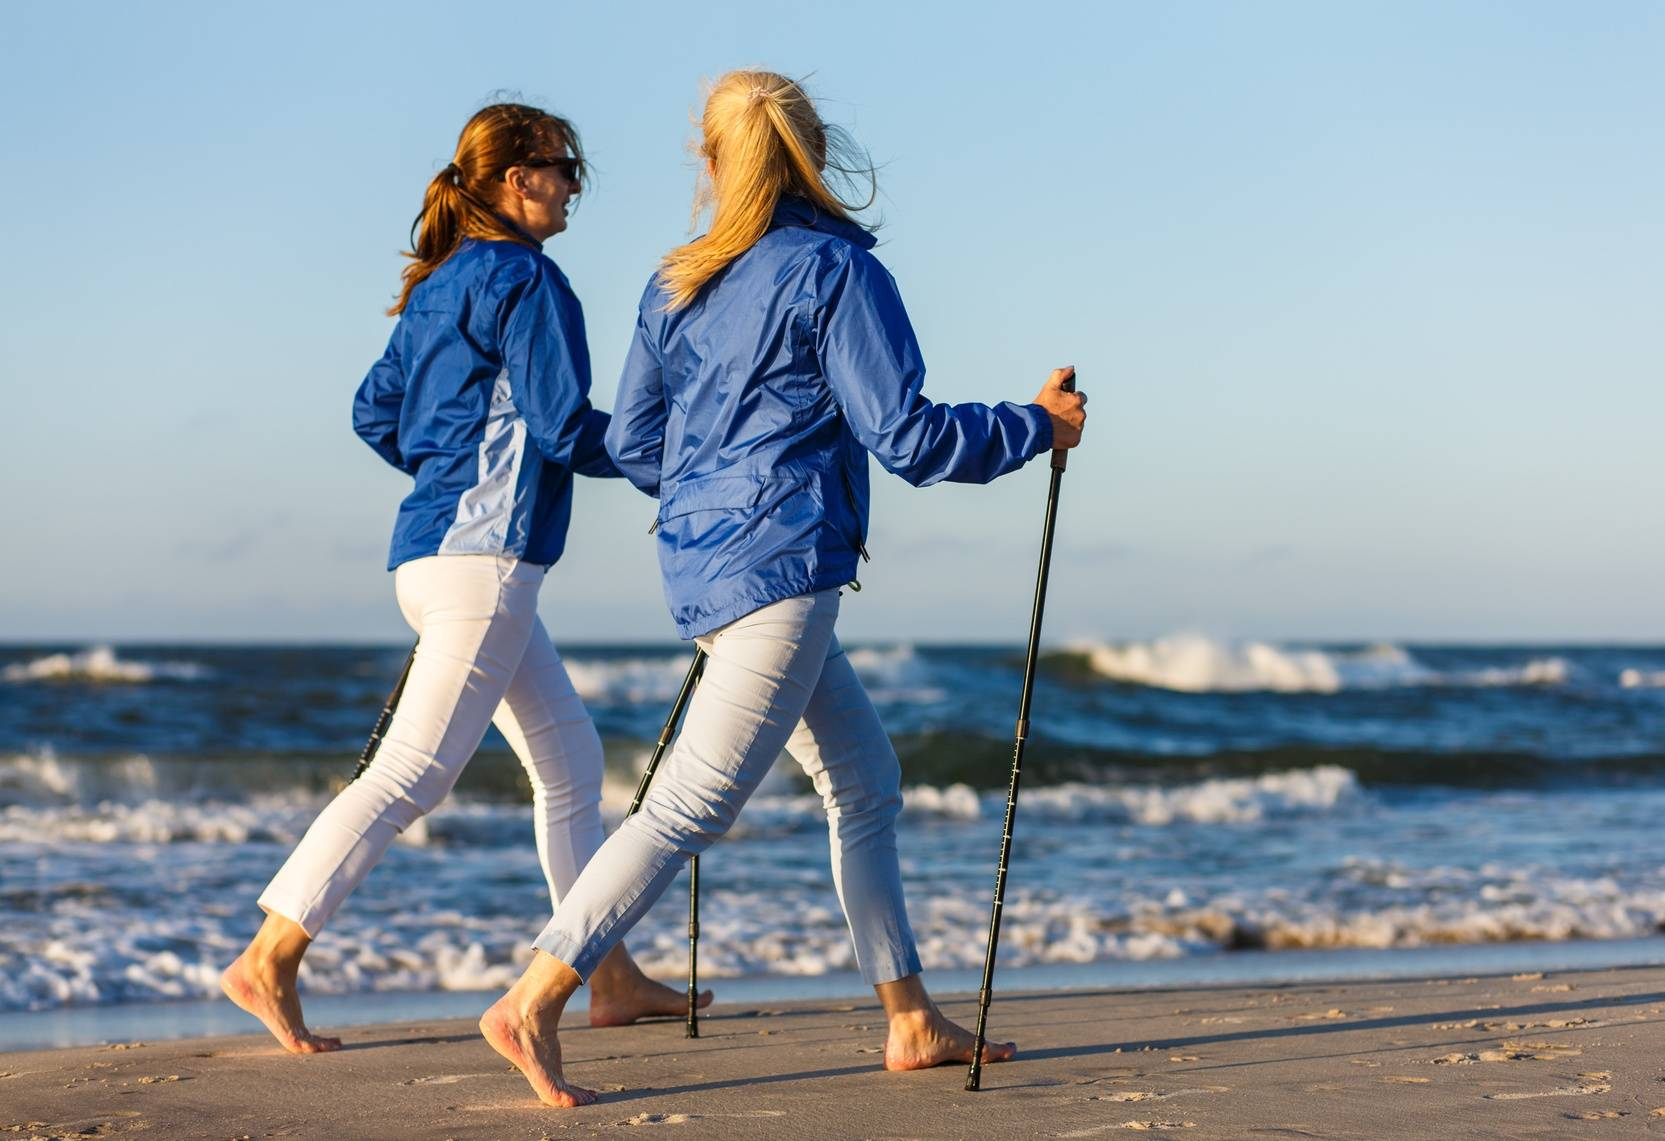 Nordic walking po plaży - jak uprawiać nordic walking.